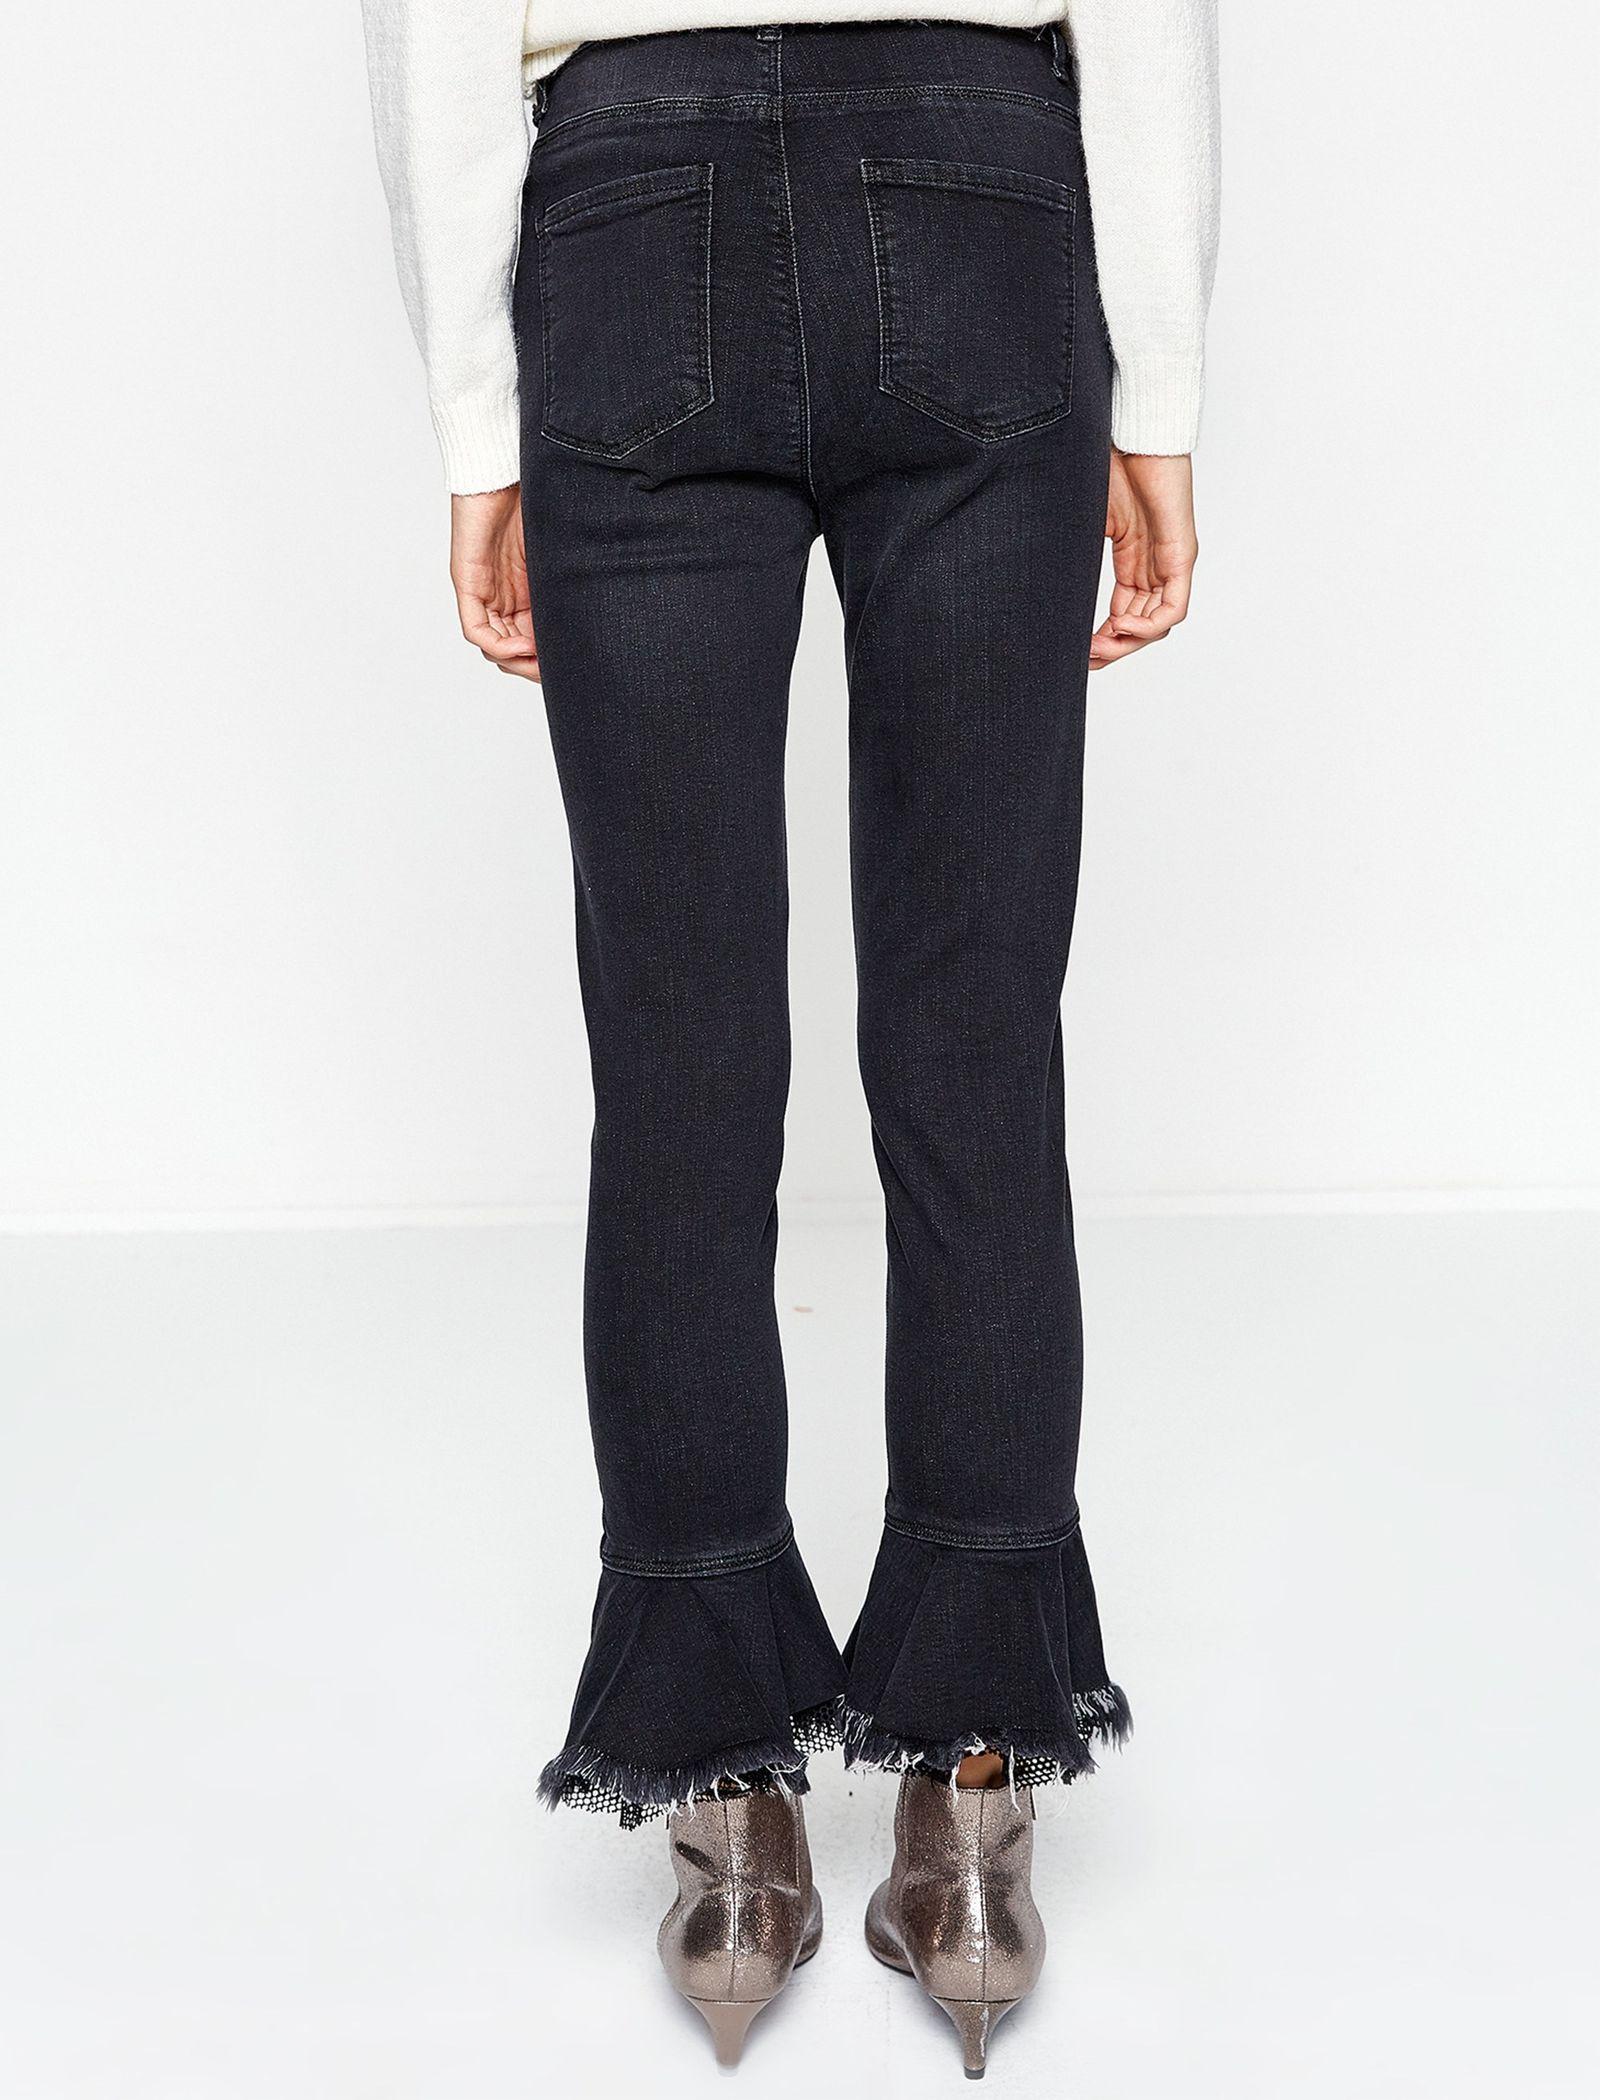 شلوار جین دم پا گشاد زنانه - کوتون - مشکي - 5